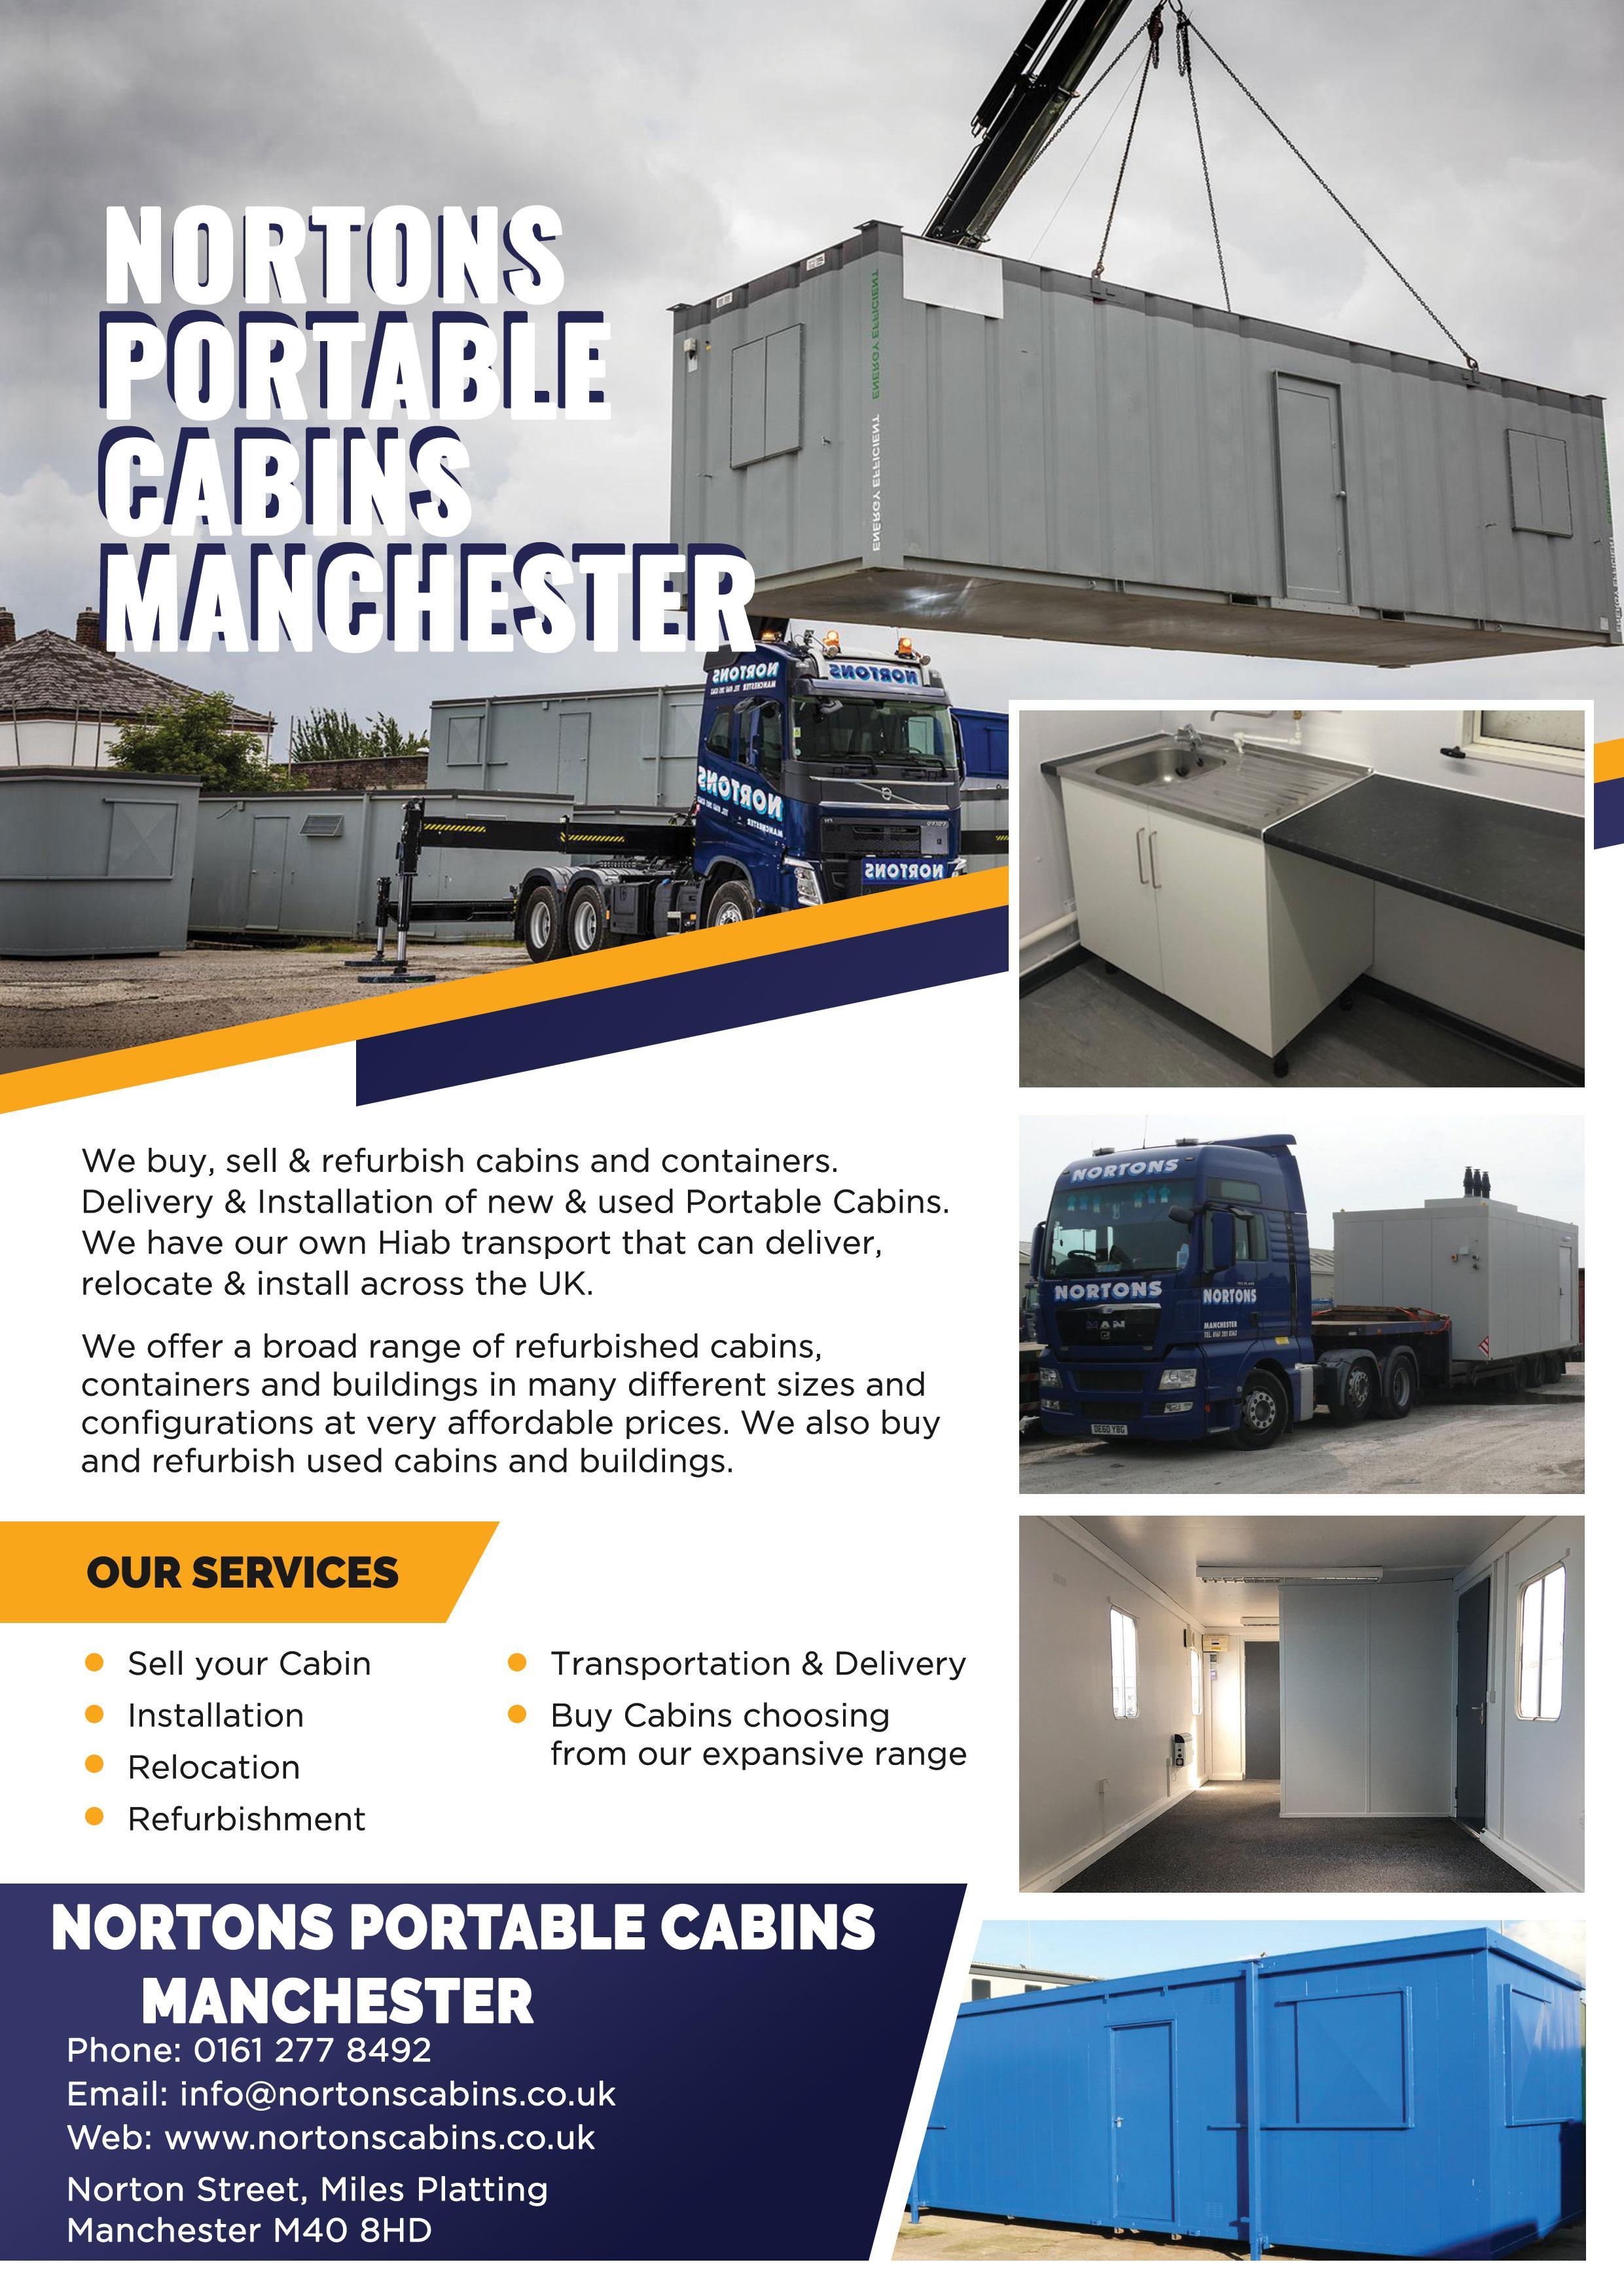 nortons-portable-cabins-manchester-4.jpg